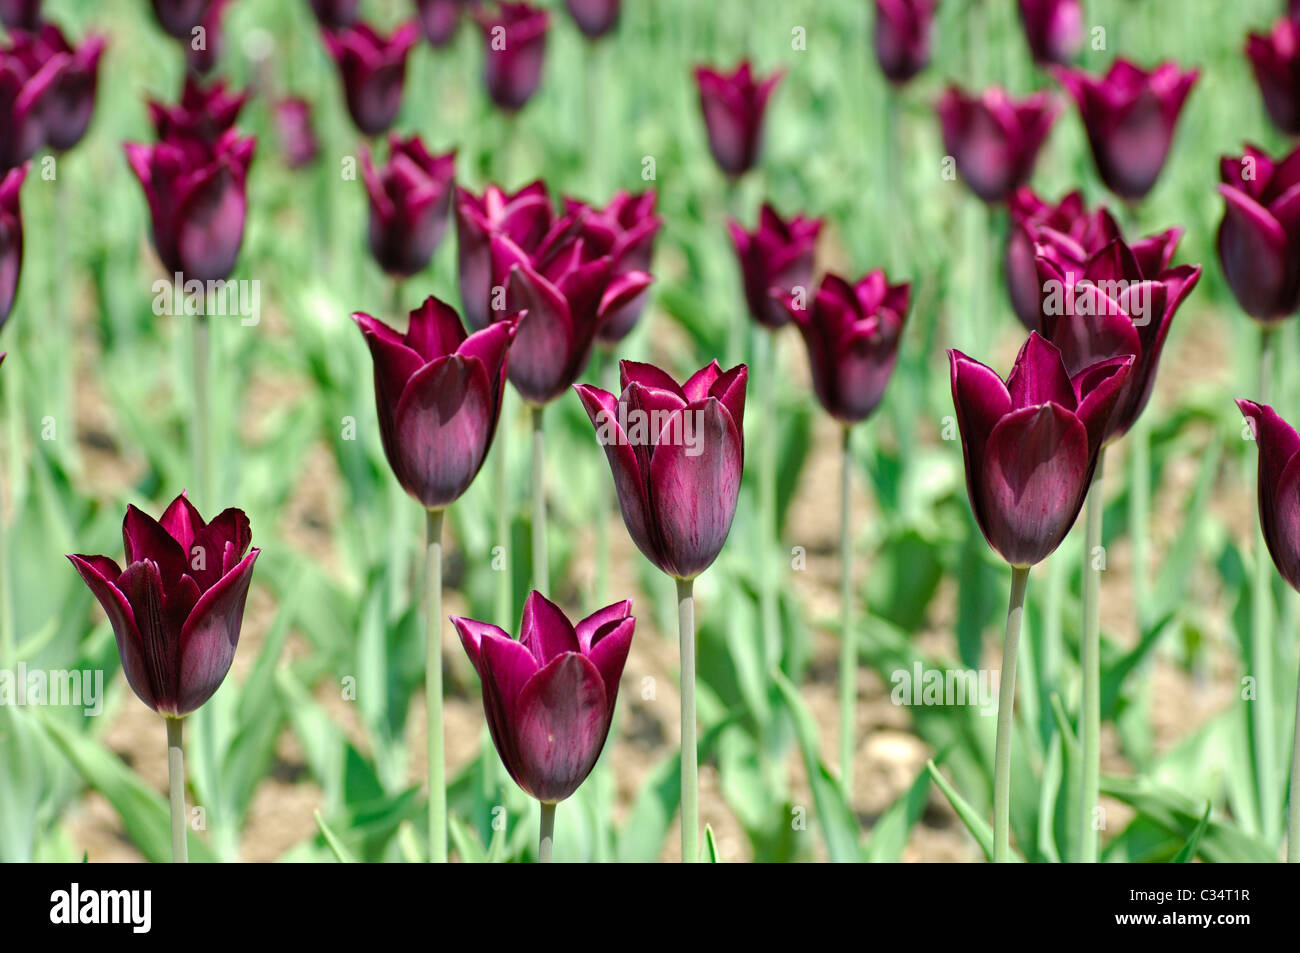 Havran Triumph Tulips, Dutch Tulips - Stock Image